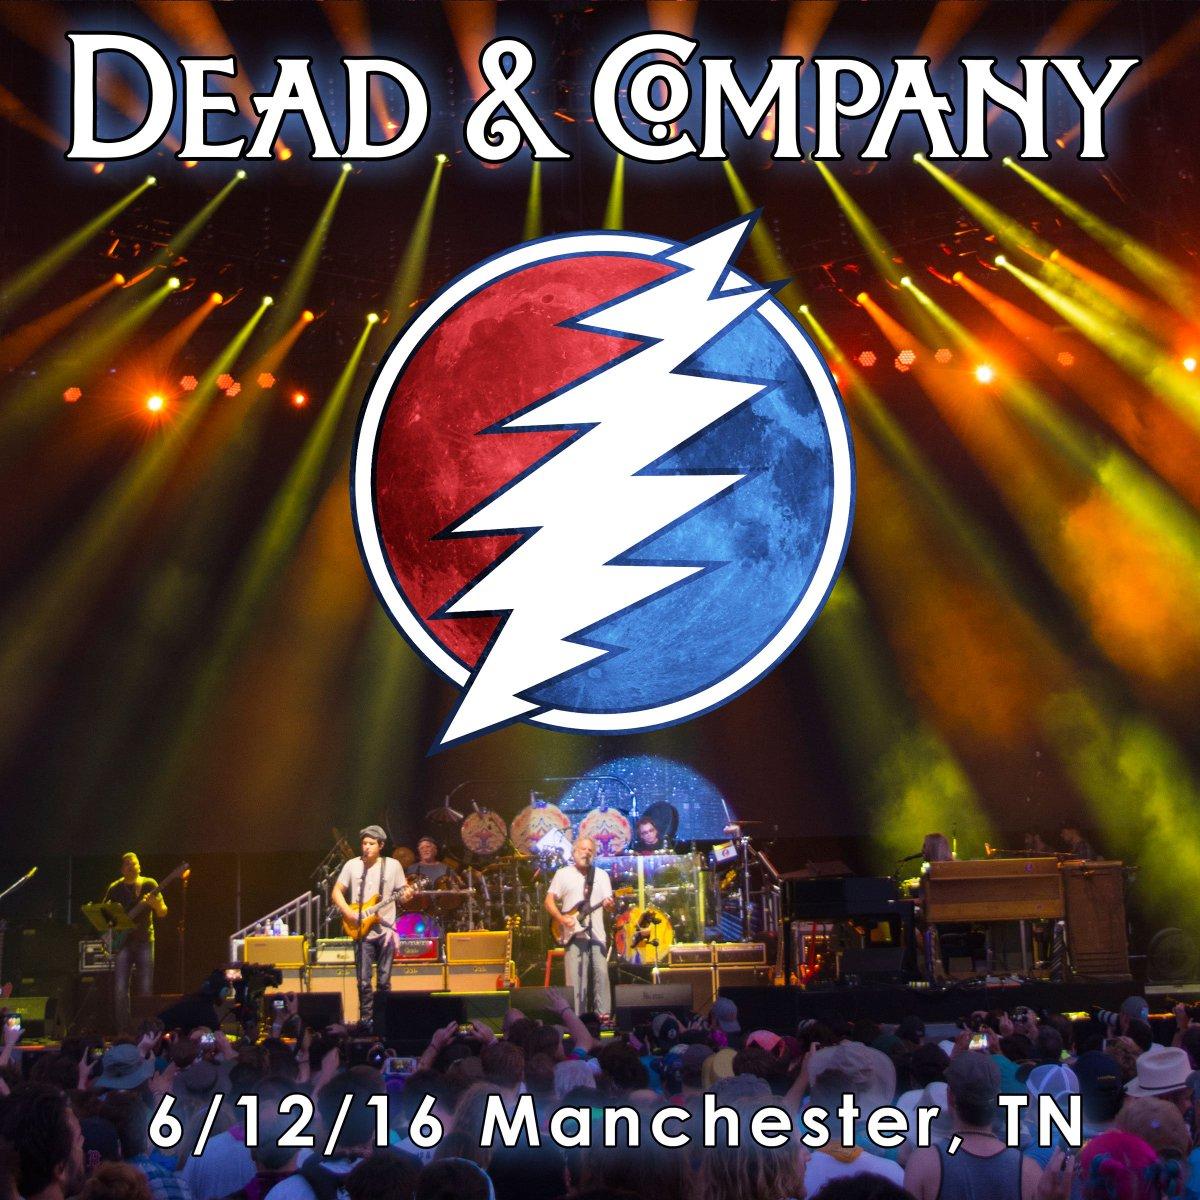 Get last night's epic @deadandcompany festival-closing @Bonnaroo show now at https://t.co/o9J3eZEX2u @nugsnet_app https://t.co/KEe87Eb4DO